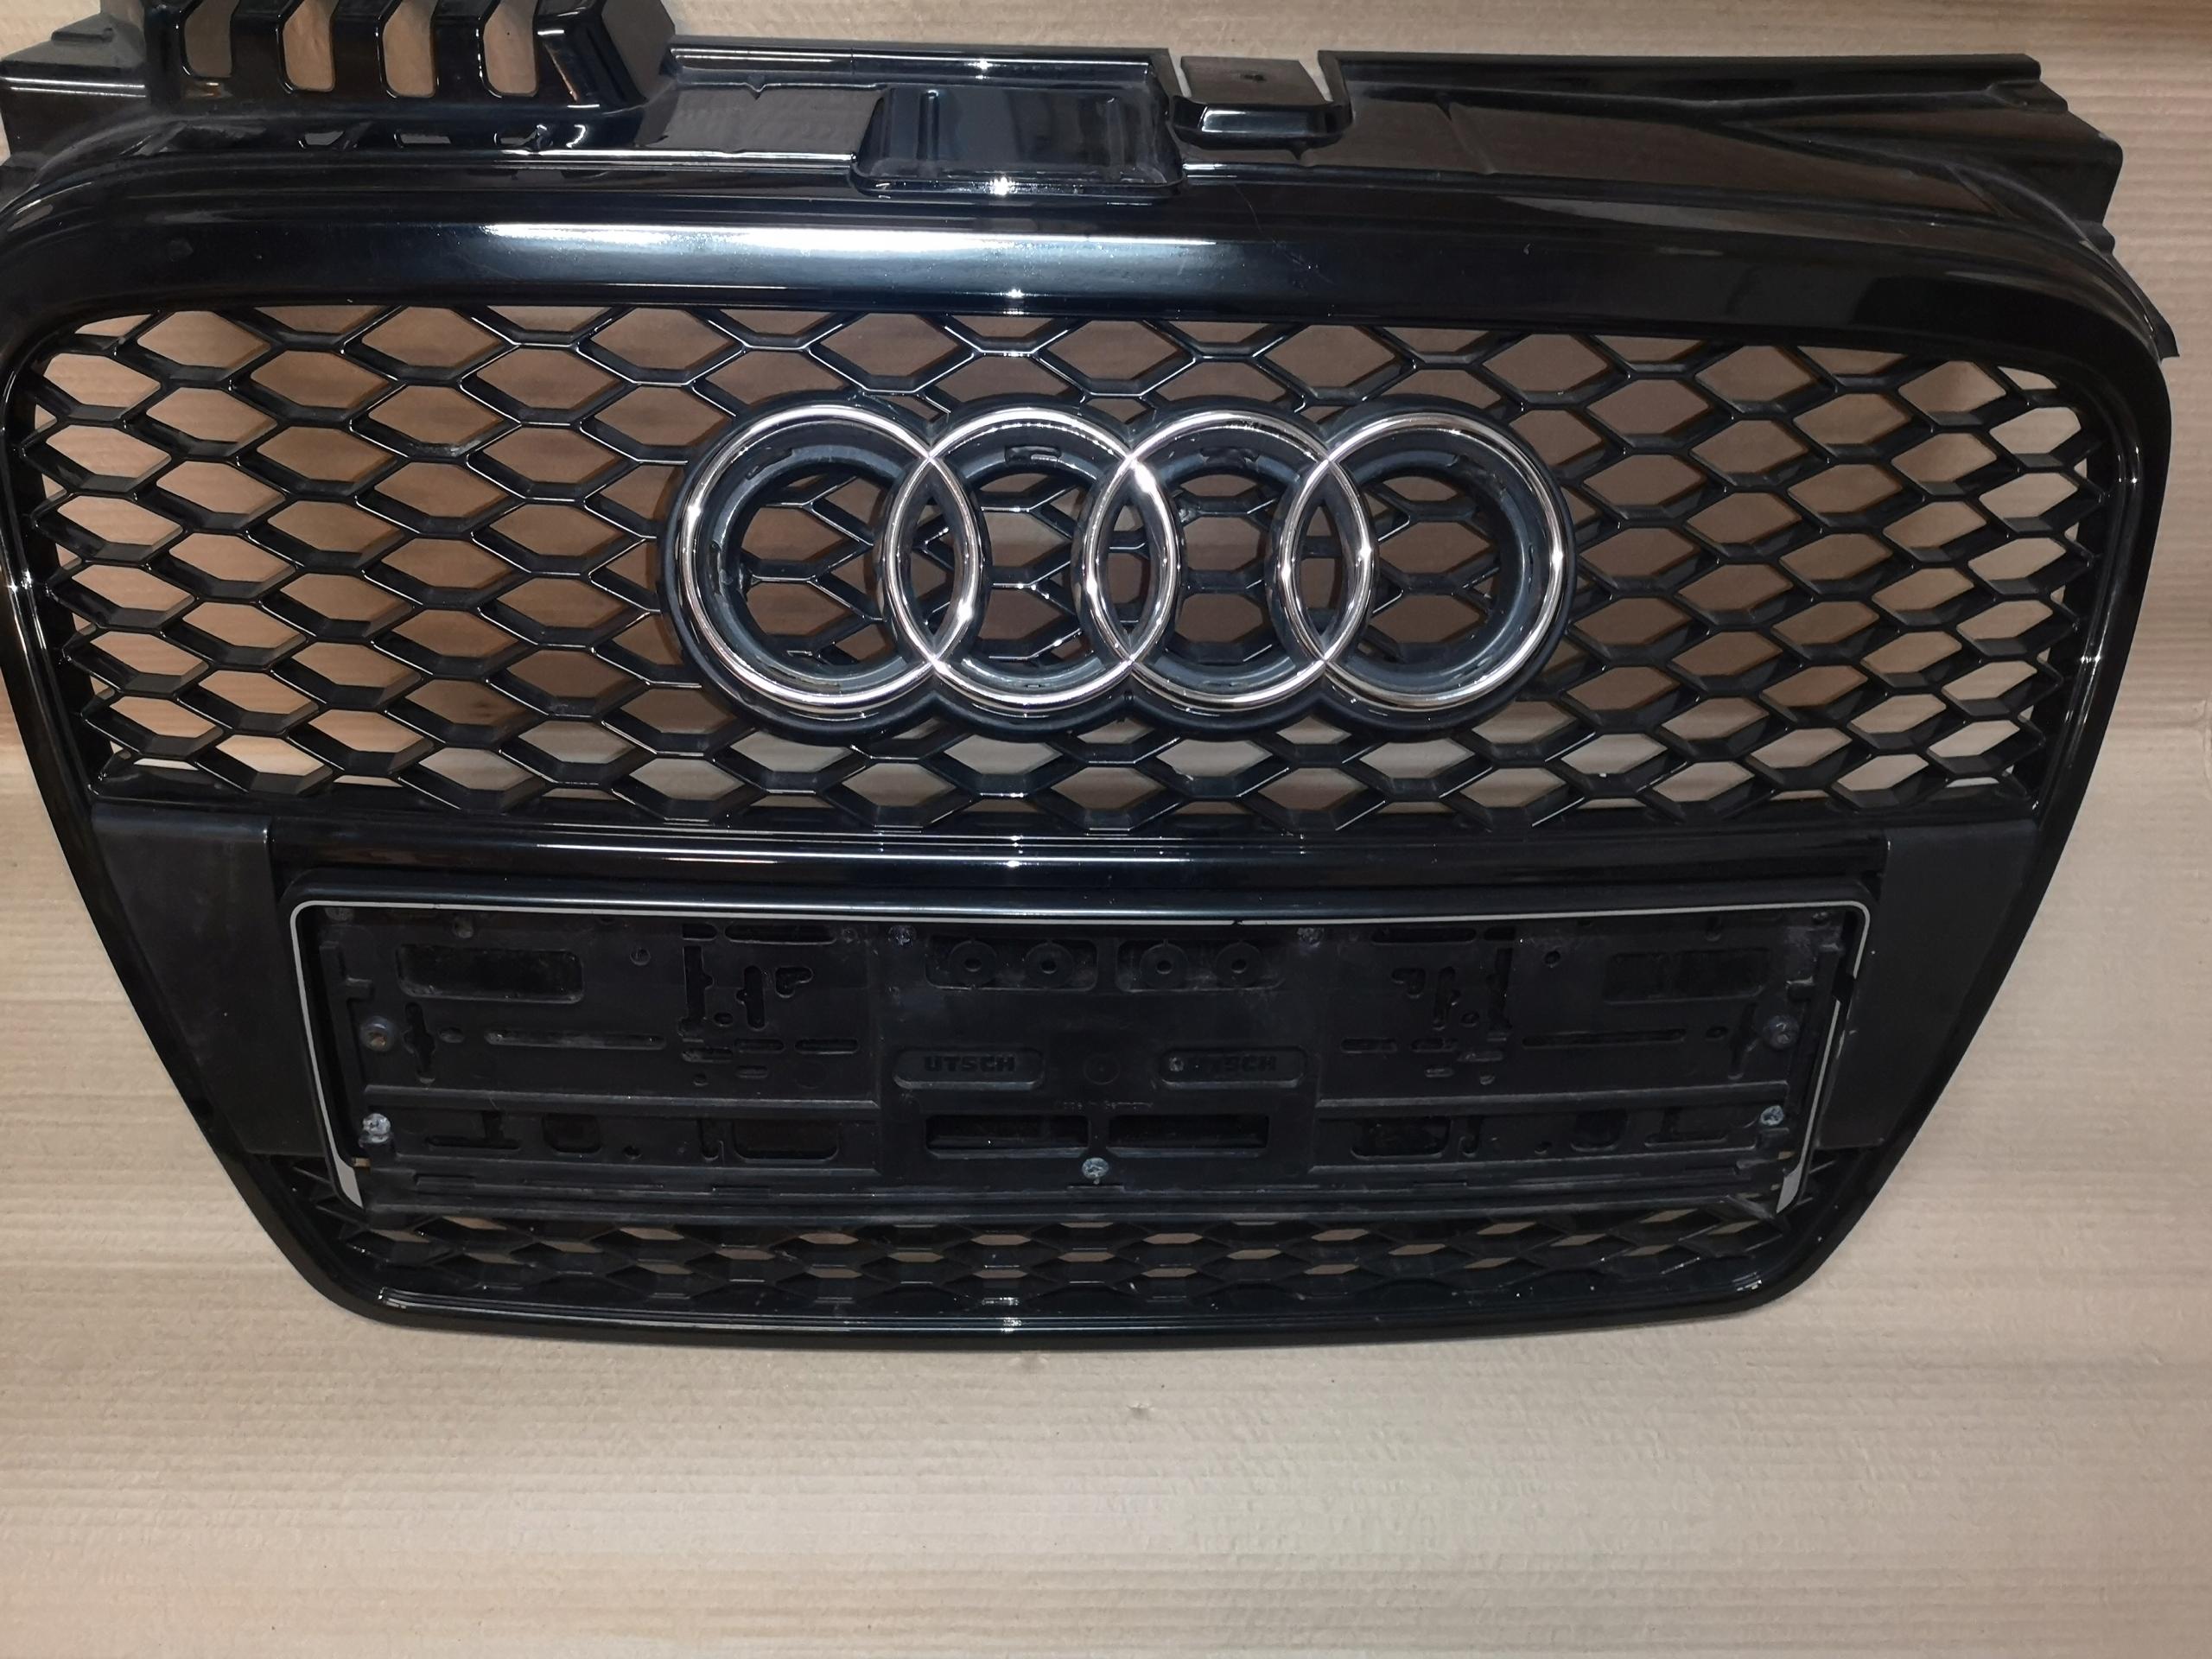 Grill Atrapa Audi A4 B7 Wzór Rs4 Plaster Miodu 7787791512